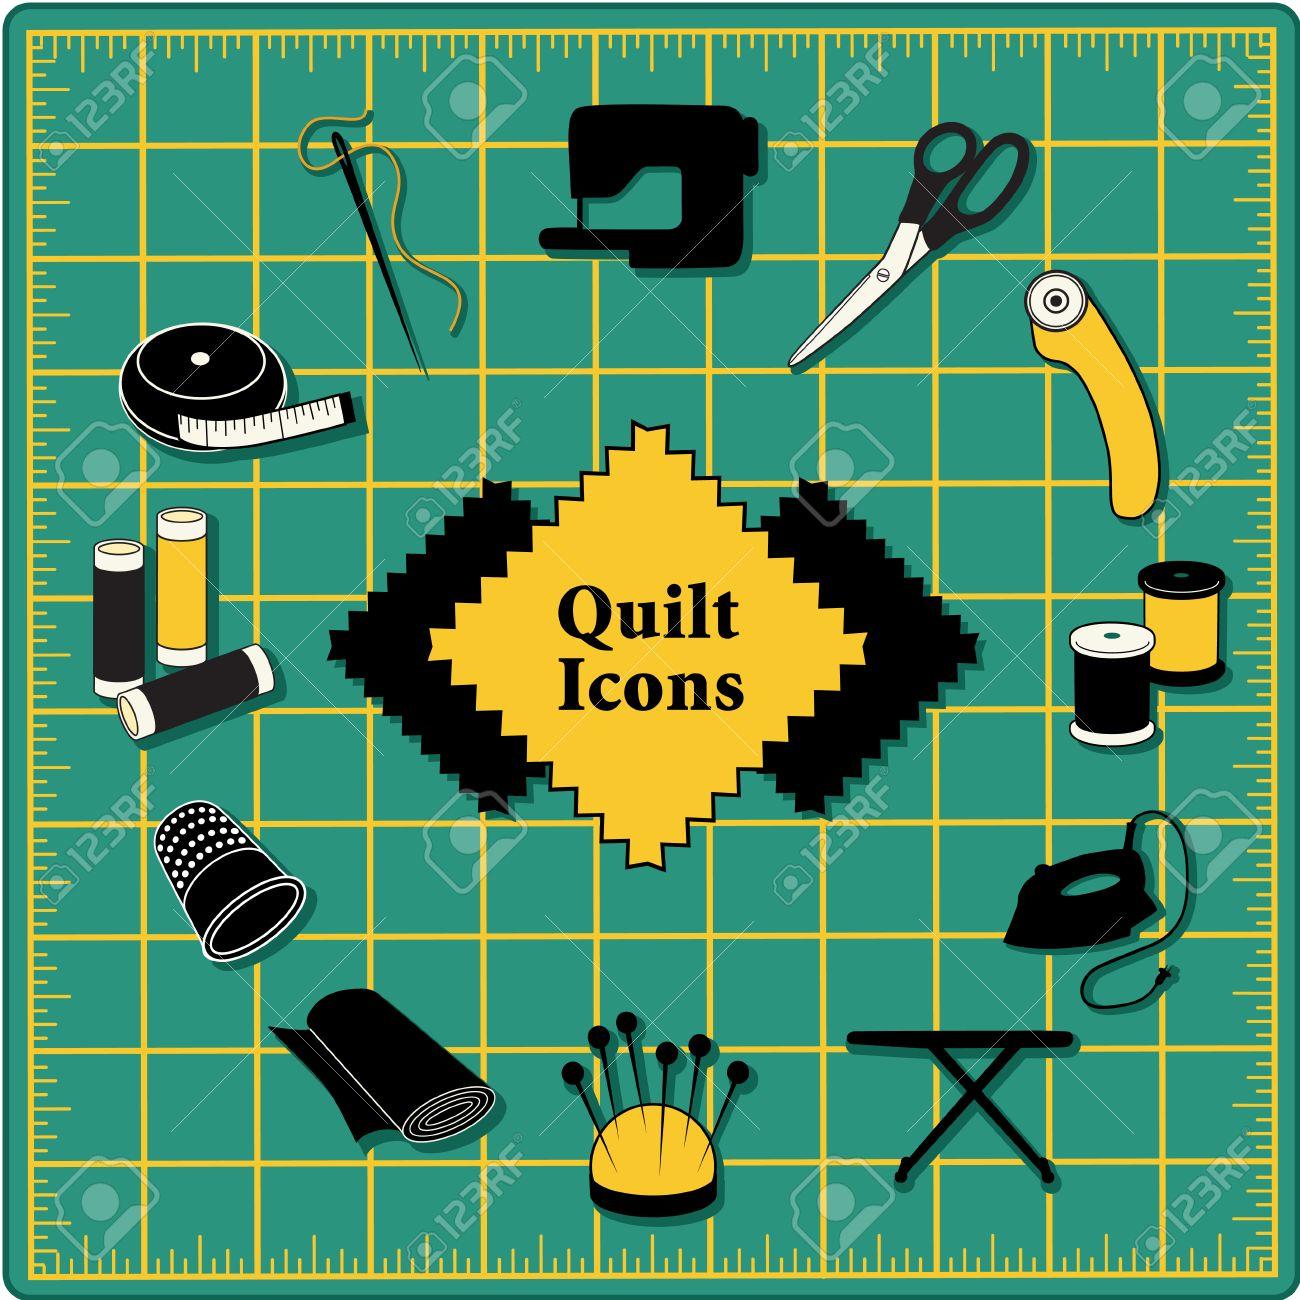 Quilting Icons Für DIY Nähen: Stifte, Nadelkissen, Nadel, Faden ...